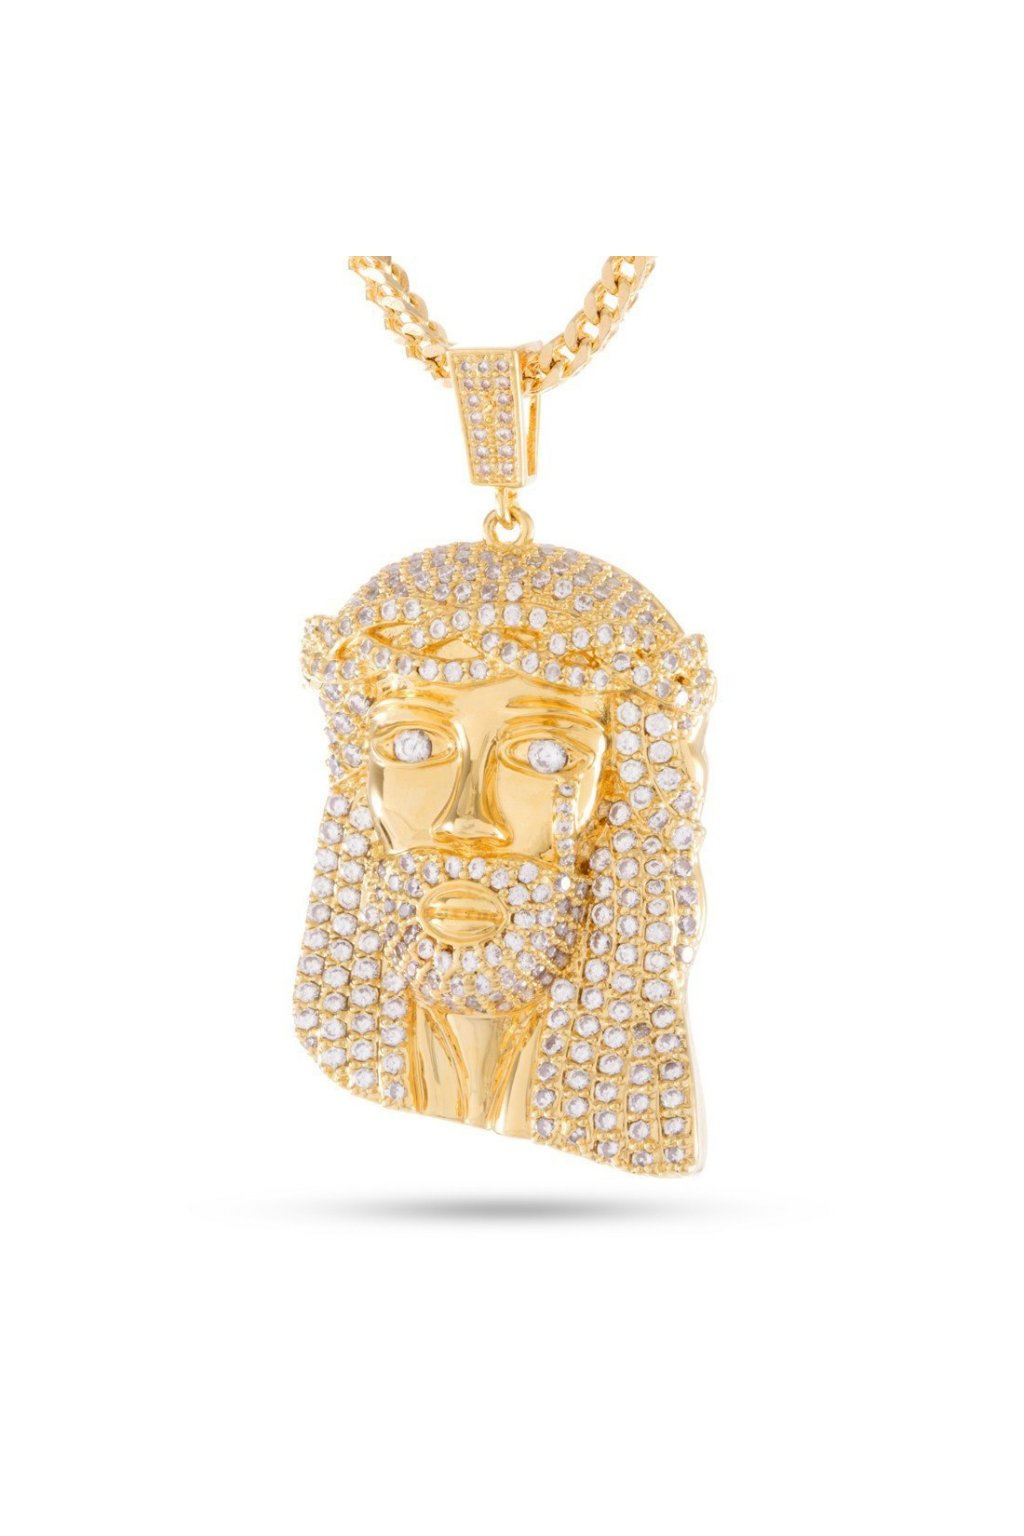 NKX10779 King Ice 14k Yellow Gold CZ Jesus Piece Necklace 7dd7e9df 61d1 40d1 bebb c6f452caa555